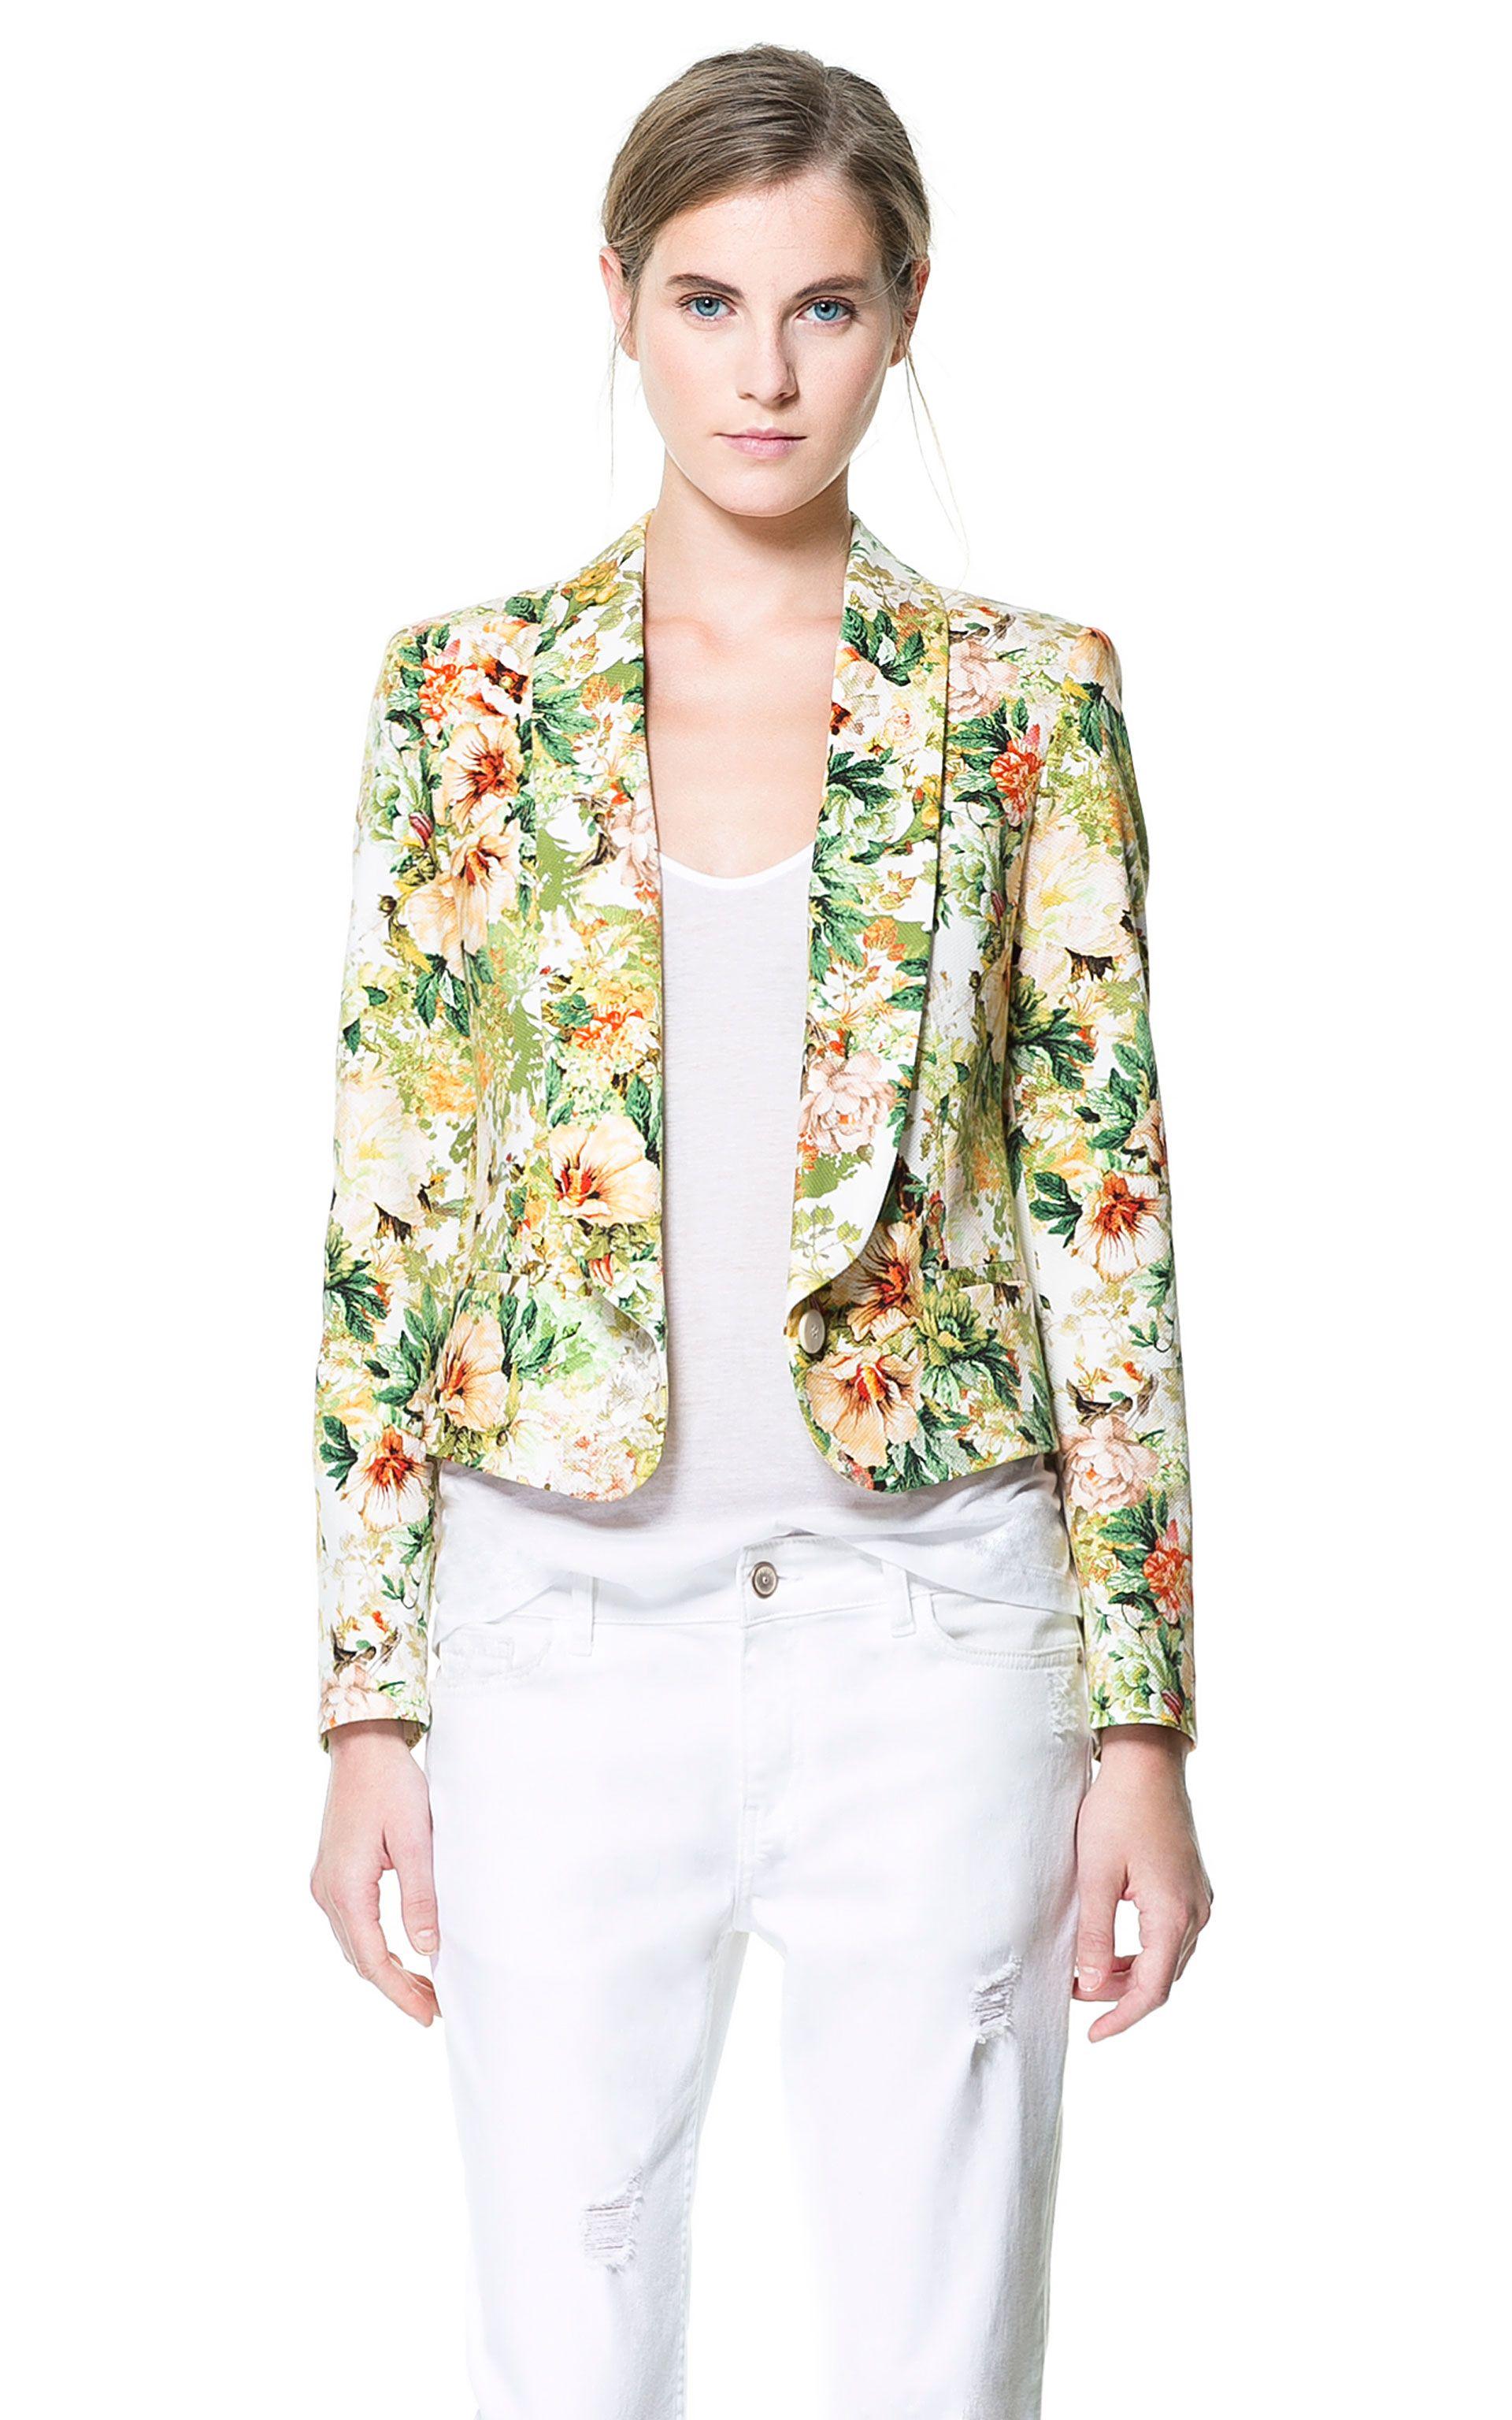 Fashion Flower Jaket Anak Hello Kitty Turkis Daftar Update Harga Hk Relax Merah Source 30p Floral Print Blazer Blazers